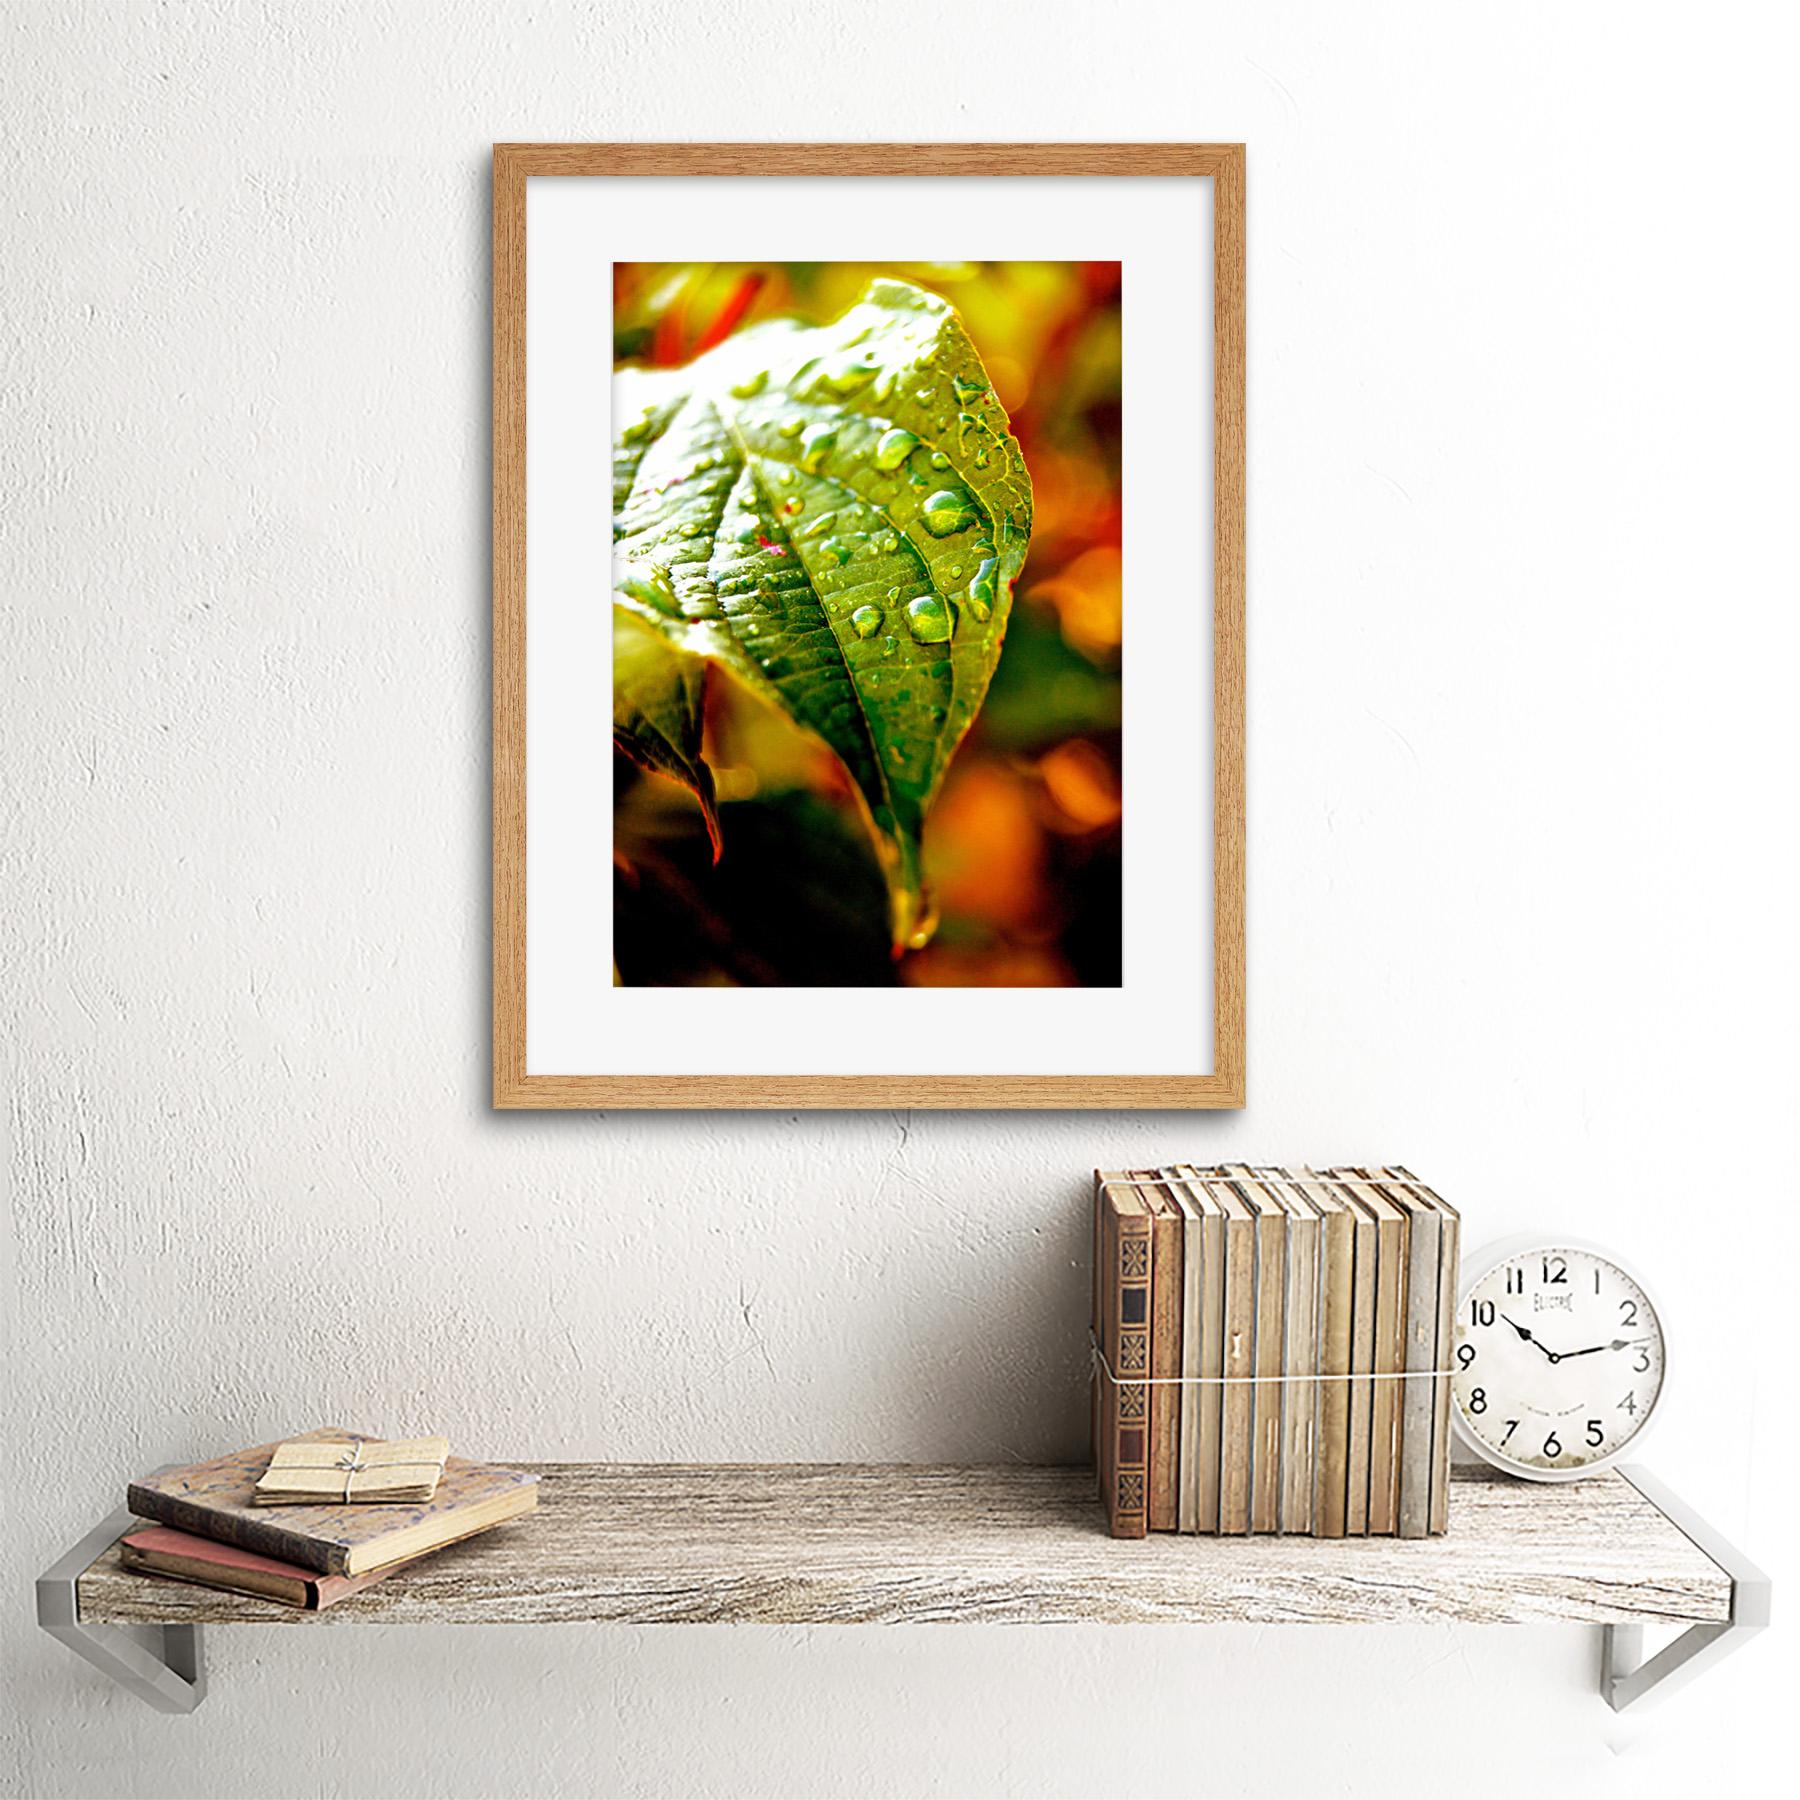 Photo-Leaf-Water-Drop-Green-Nature-Framed-Print-12x16-Inch miniatuur 13